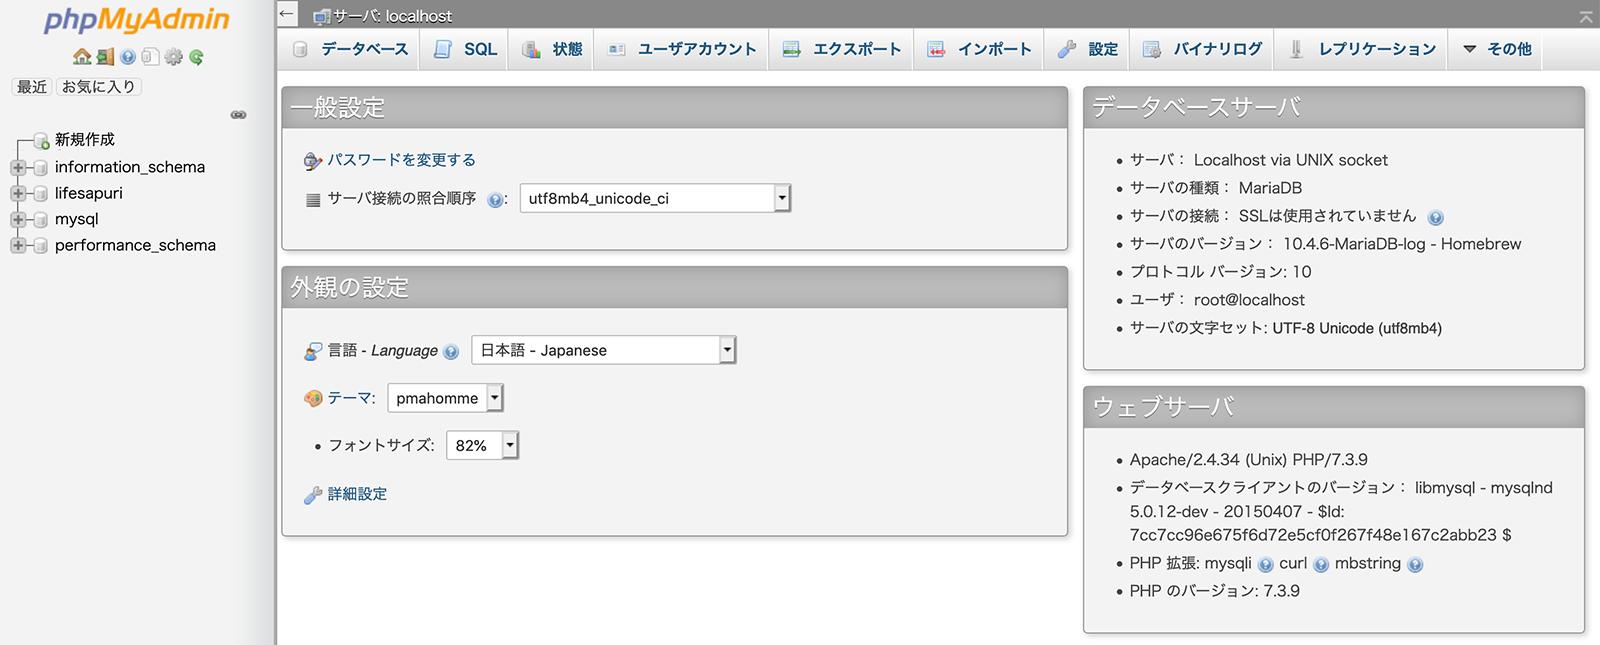 phpMyAdminの表示例